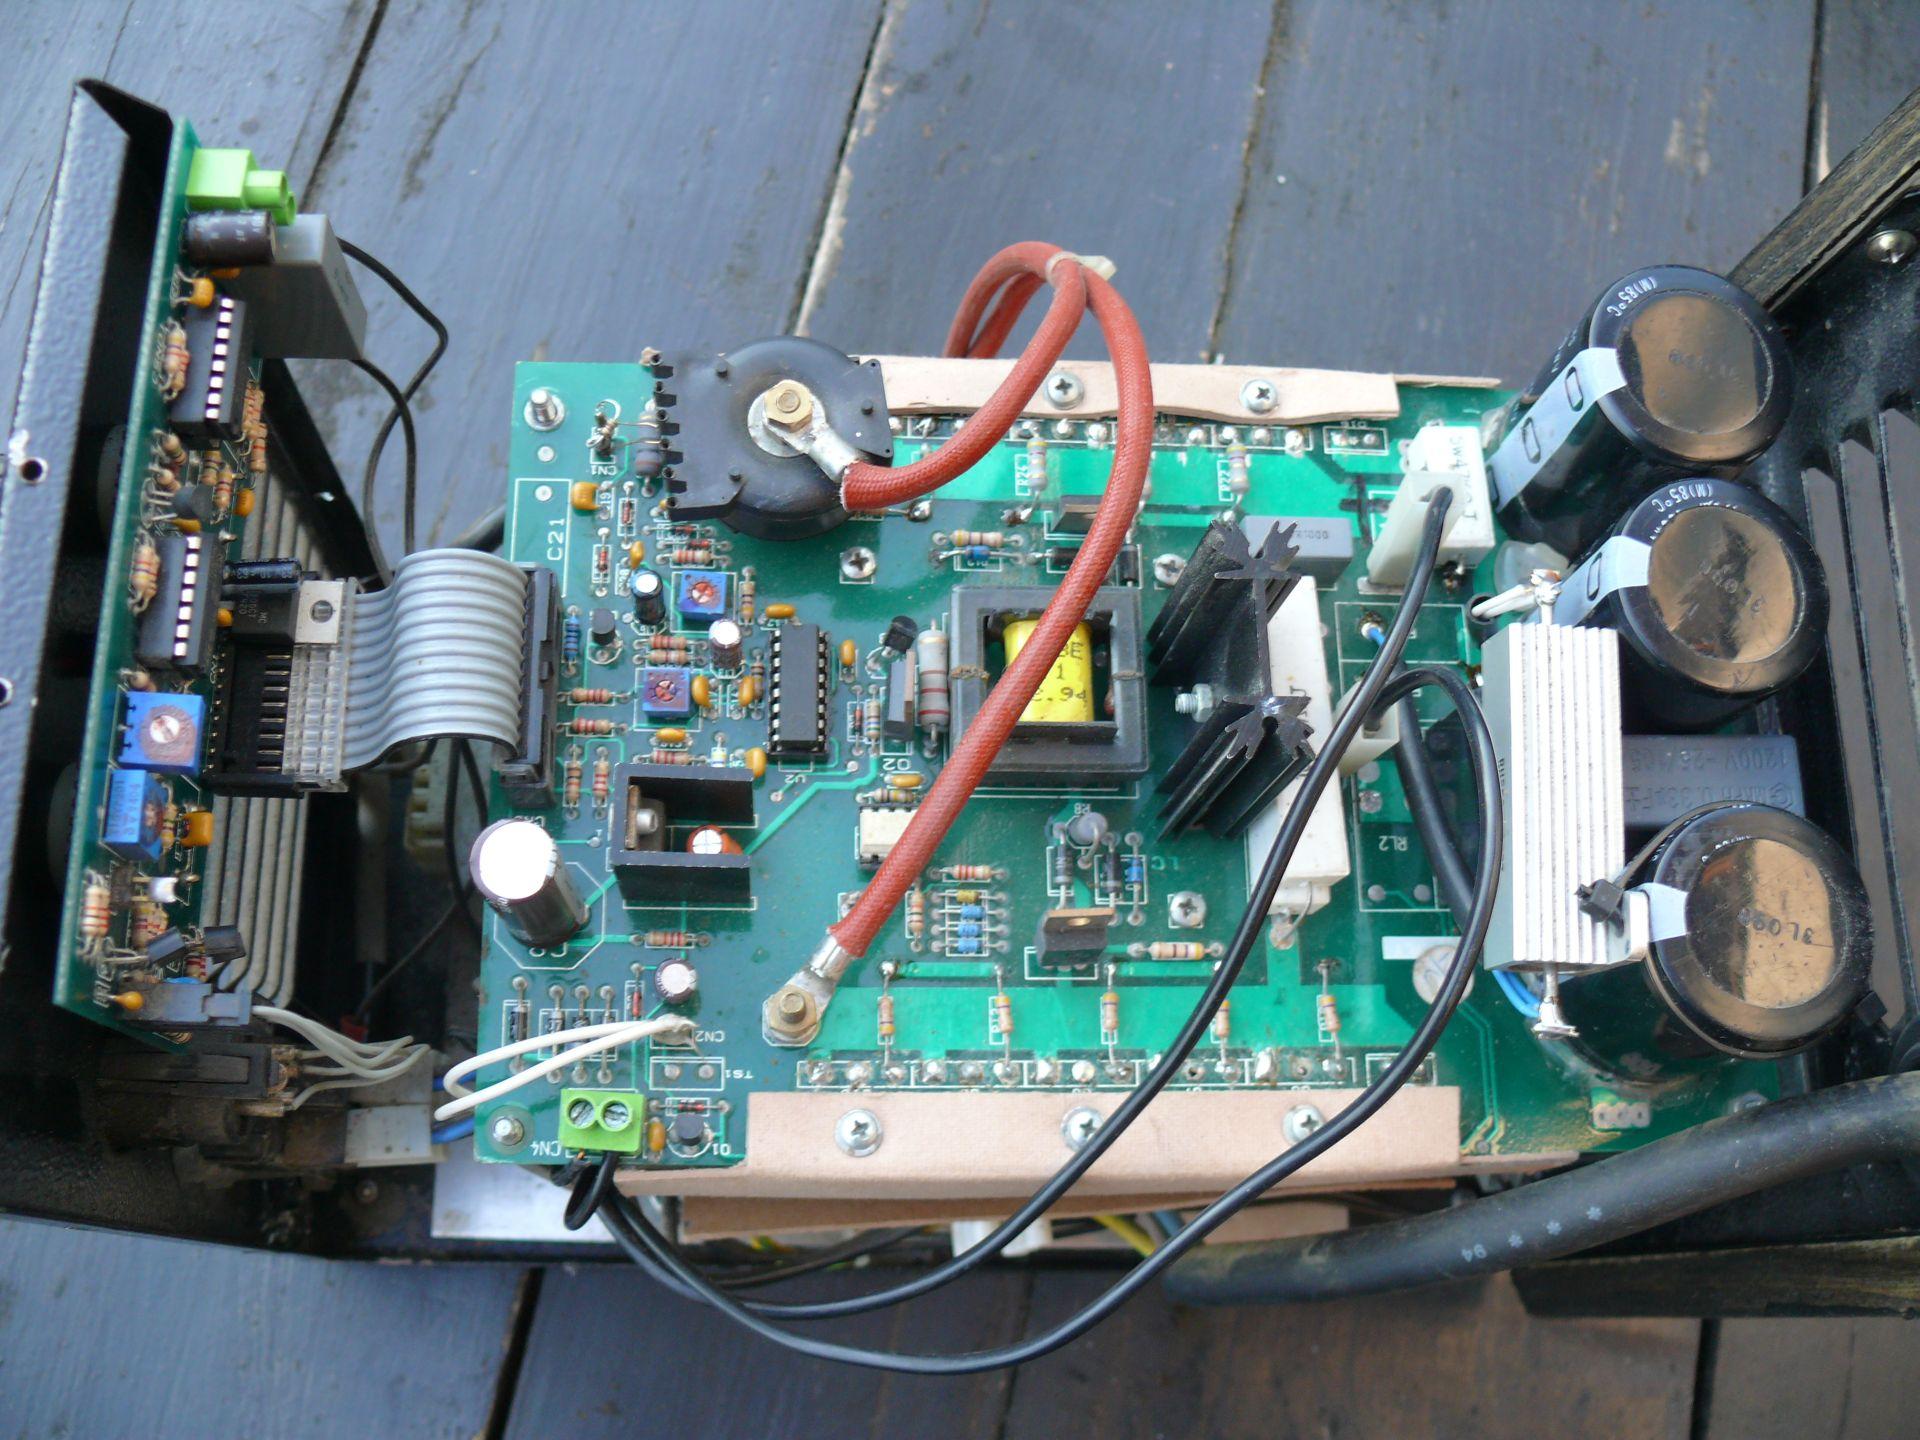 Inwerter Elektra Beckum industrie 130 Dci spawa pulsacyjnie